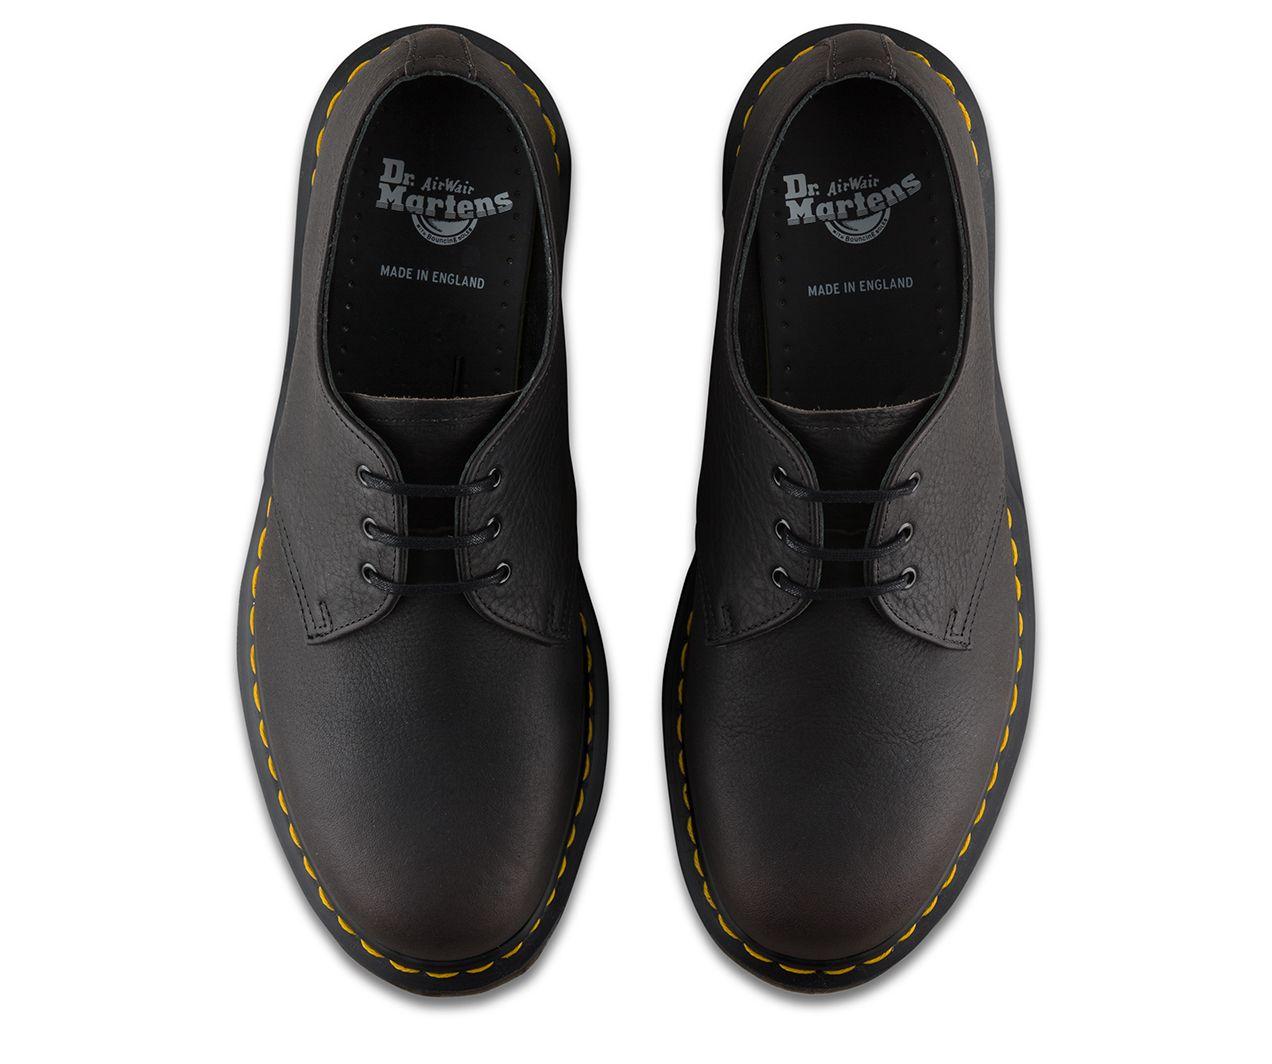 Dr Martens 1461 Virginia Dress Shoes Black   Country Attire UK